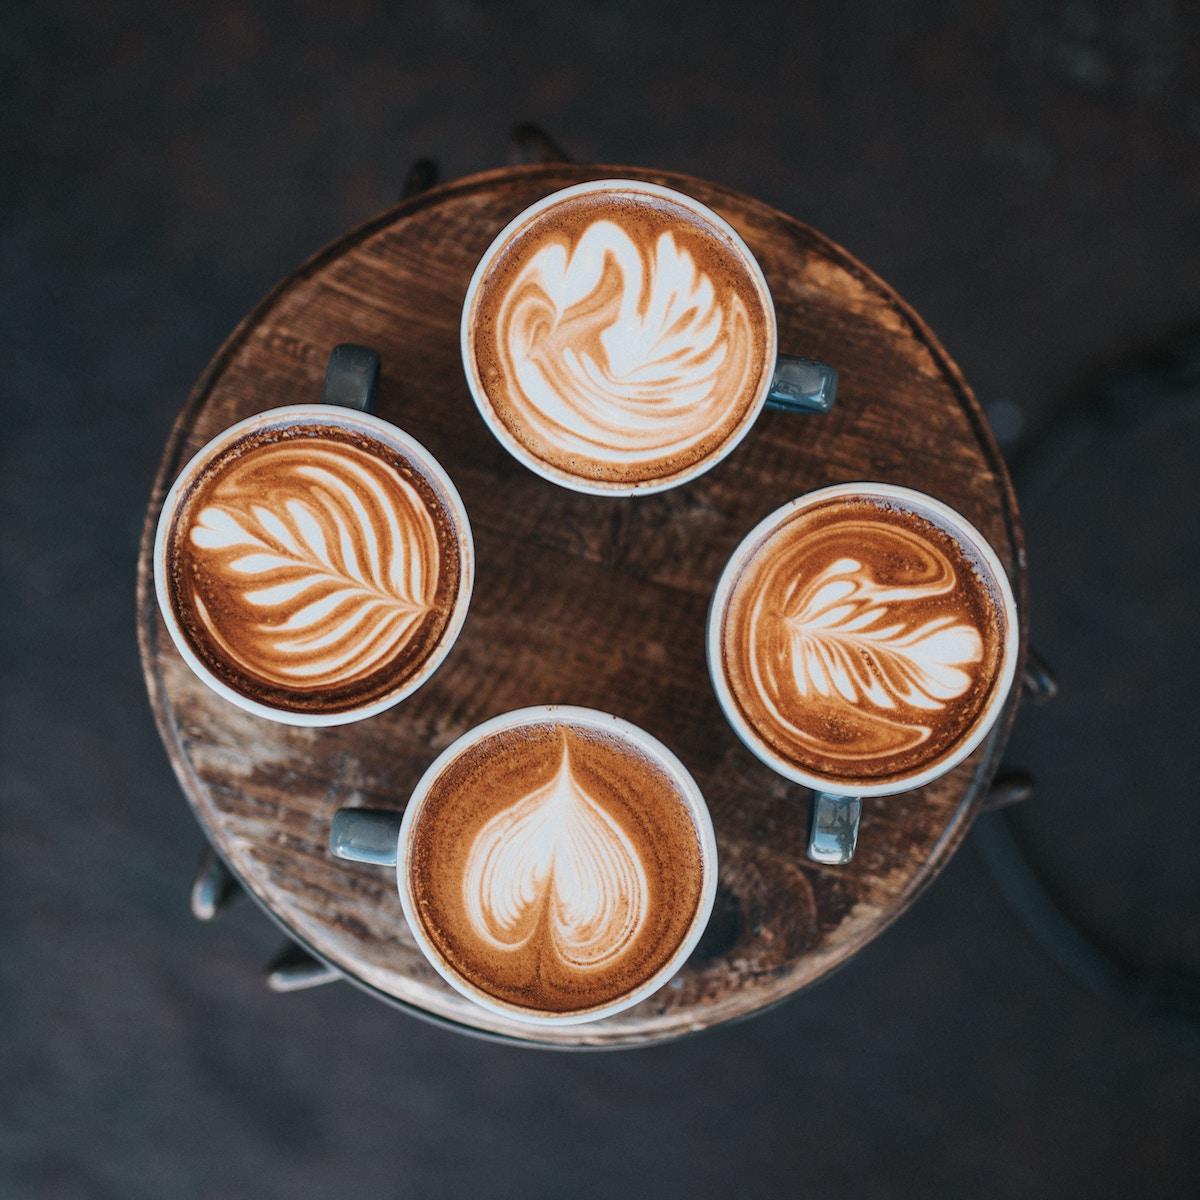 Café_Bellevue di Monaco_München